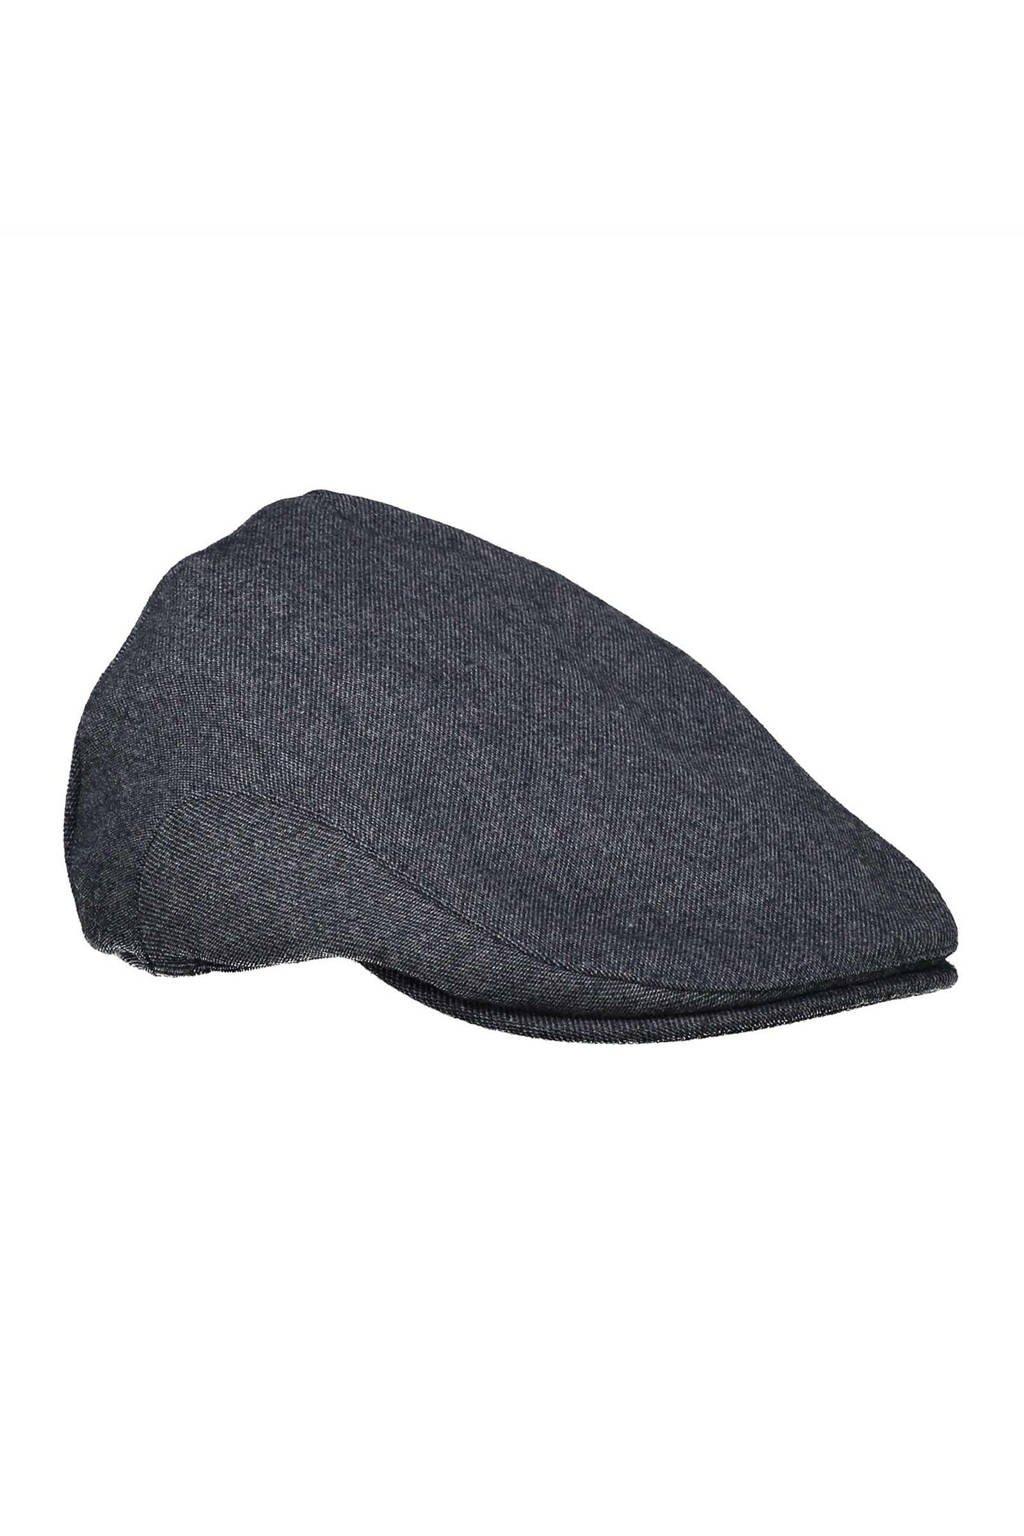 LERROS flatcap donkerblauw, Donkerblauw